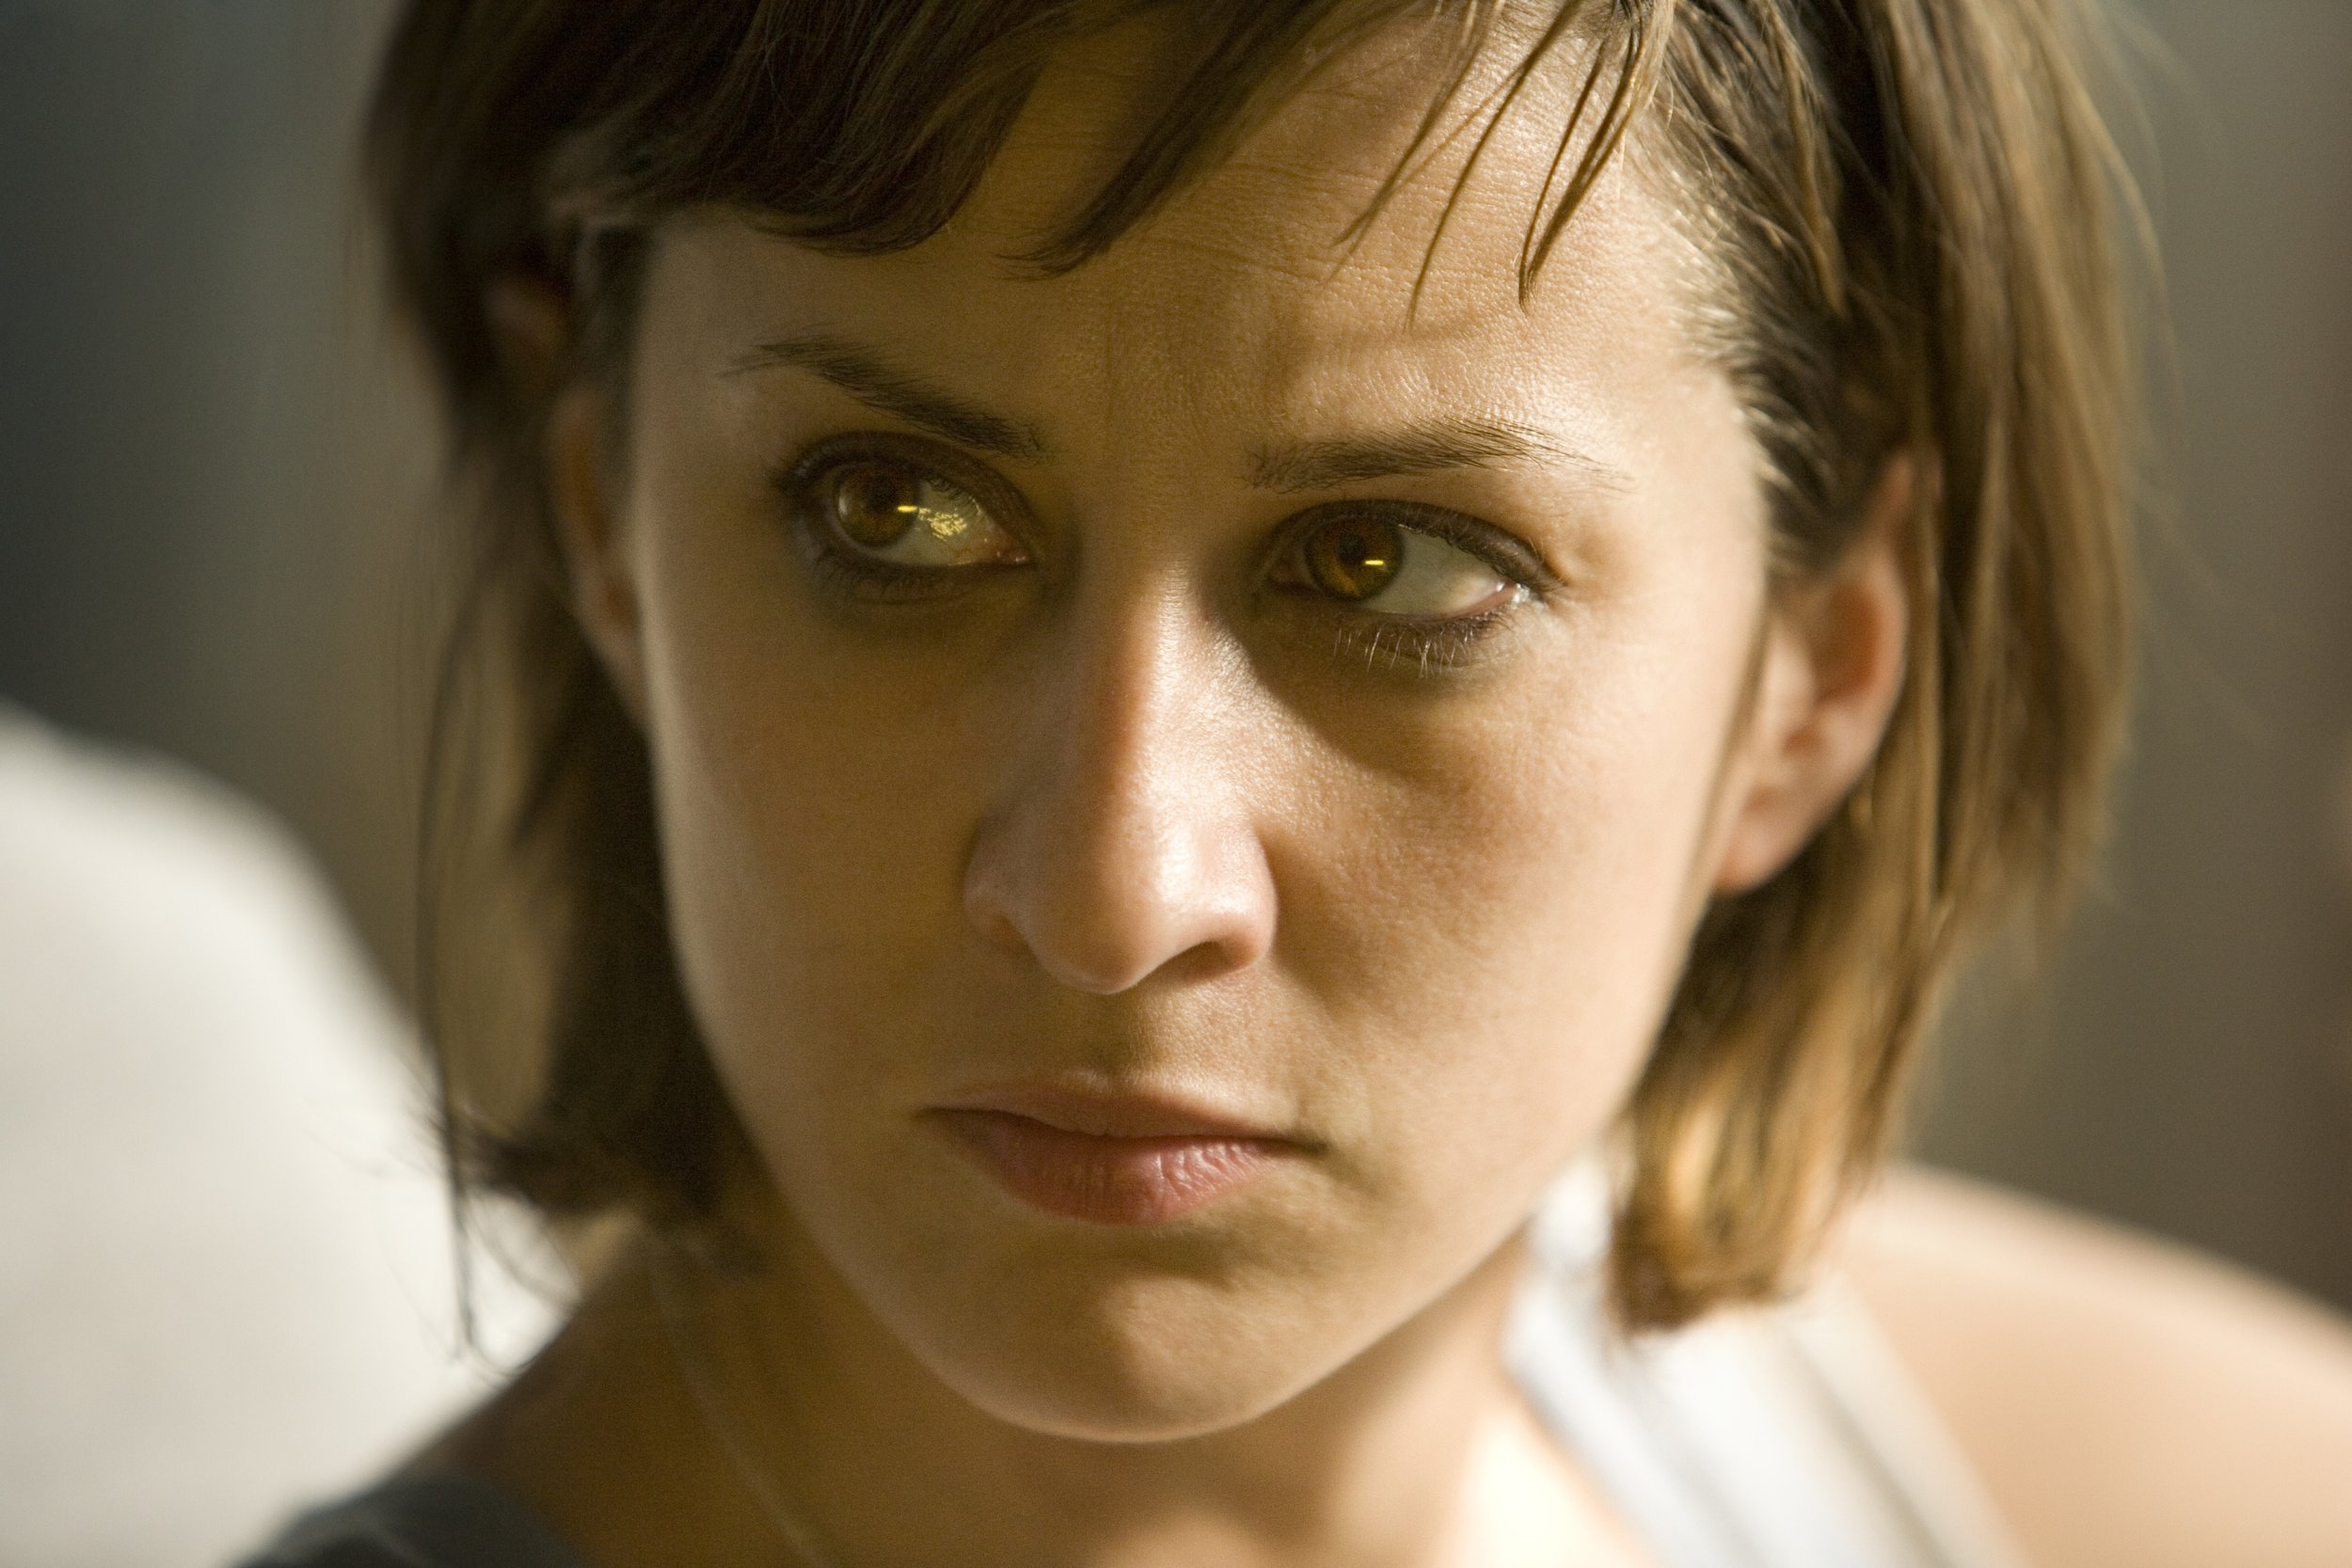 13 Alice played by Morven Christie.jpg